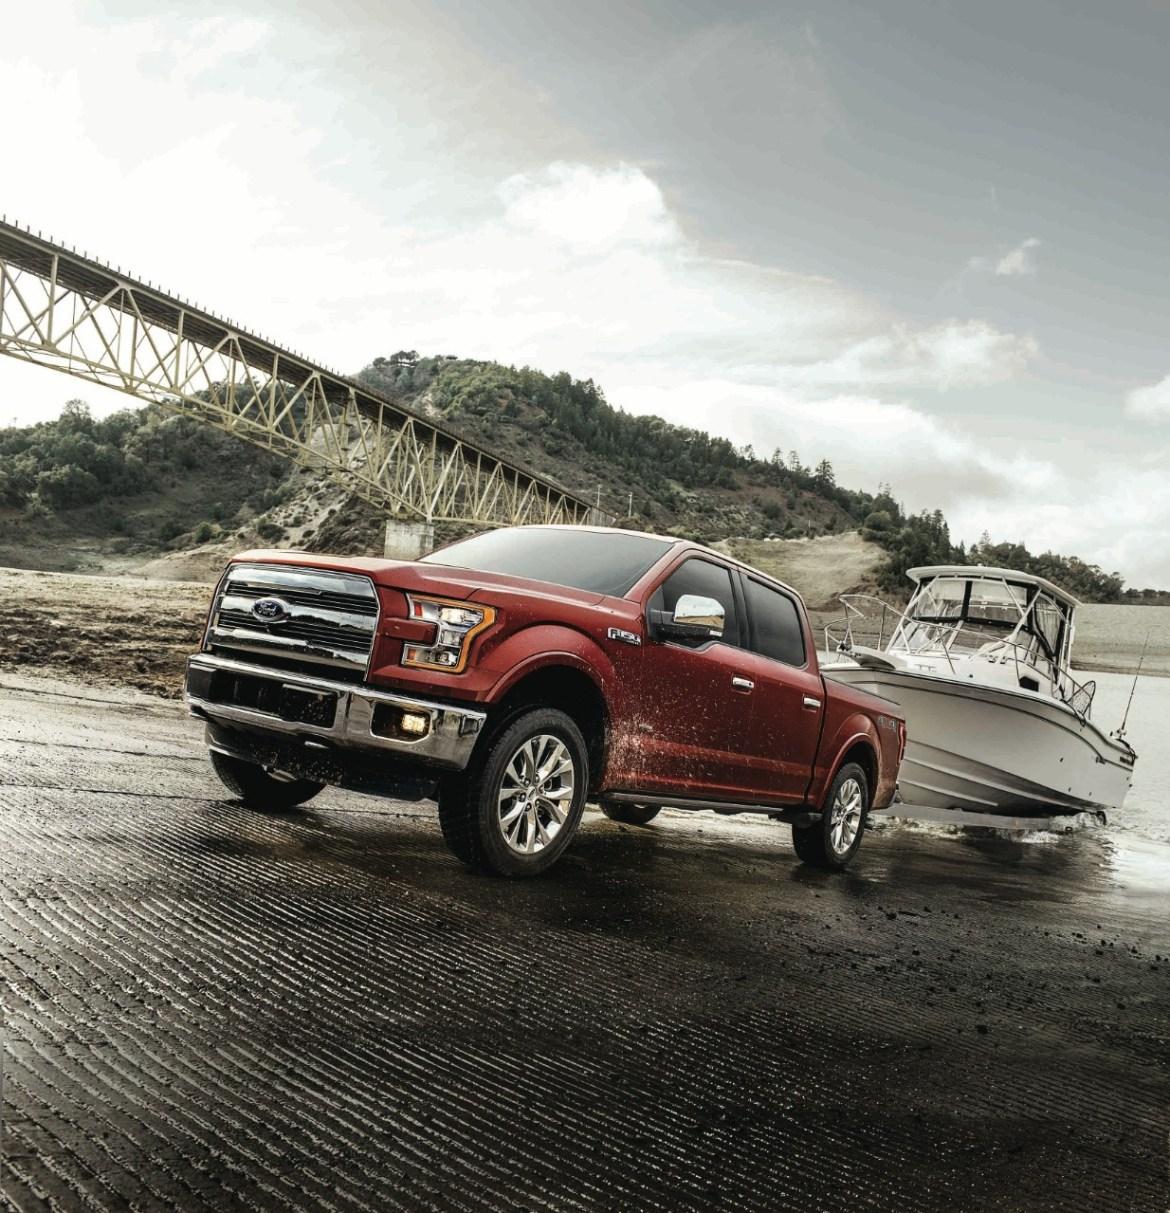 Americas best selling truck